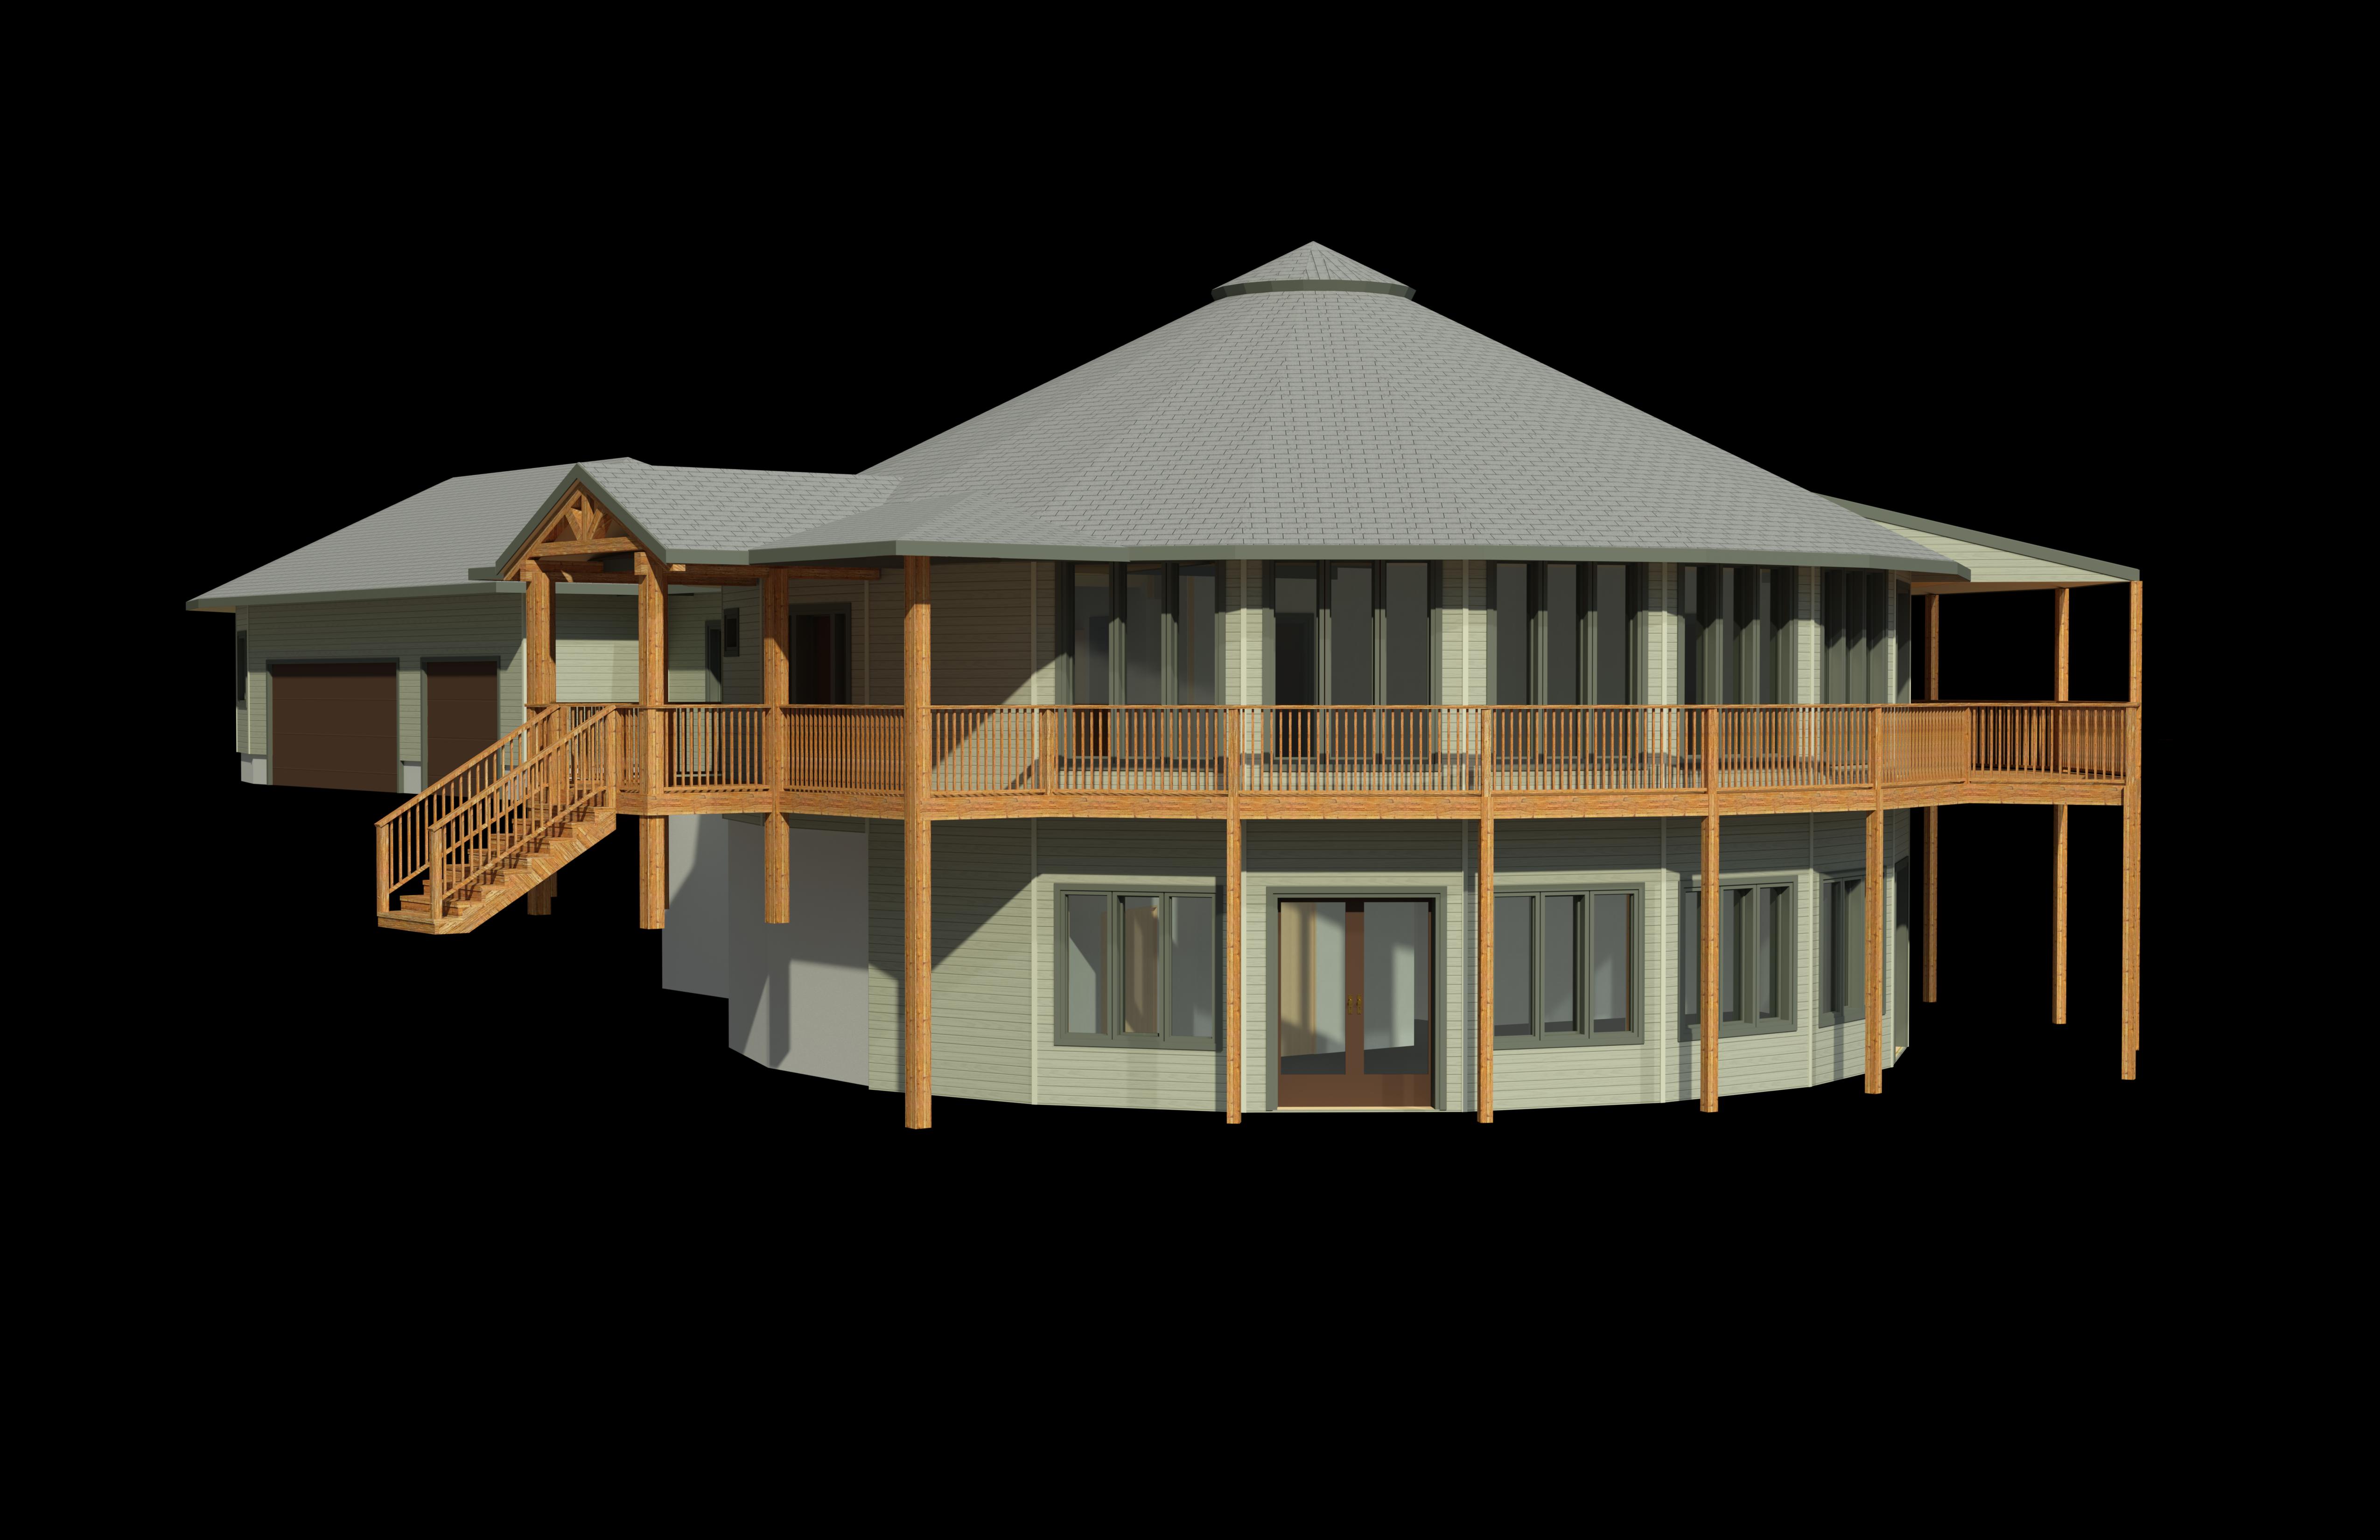 custom floorplan example 4340 deltec homes floorplan example 2070 sqft deltec homes